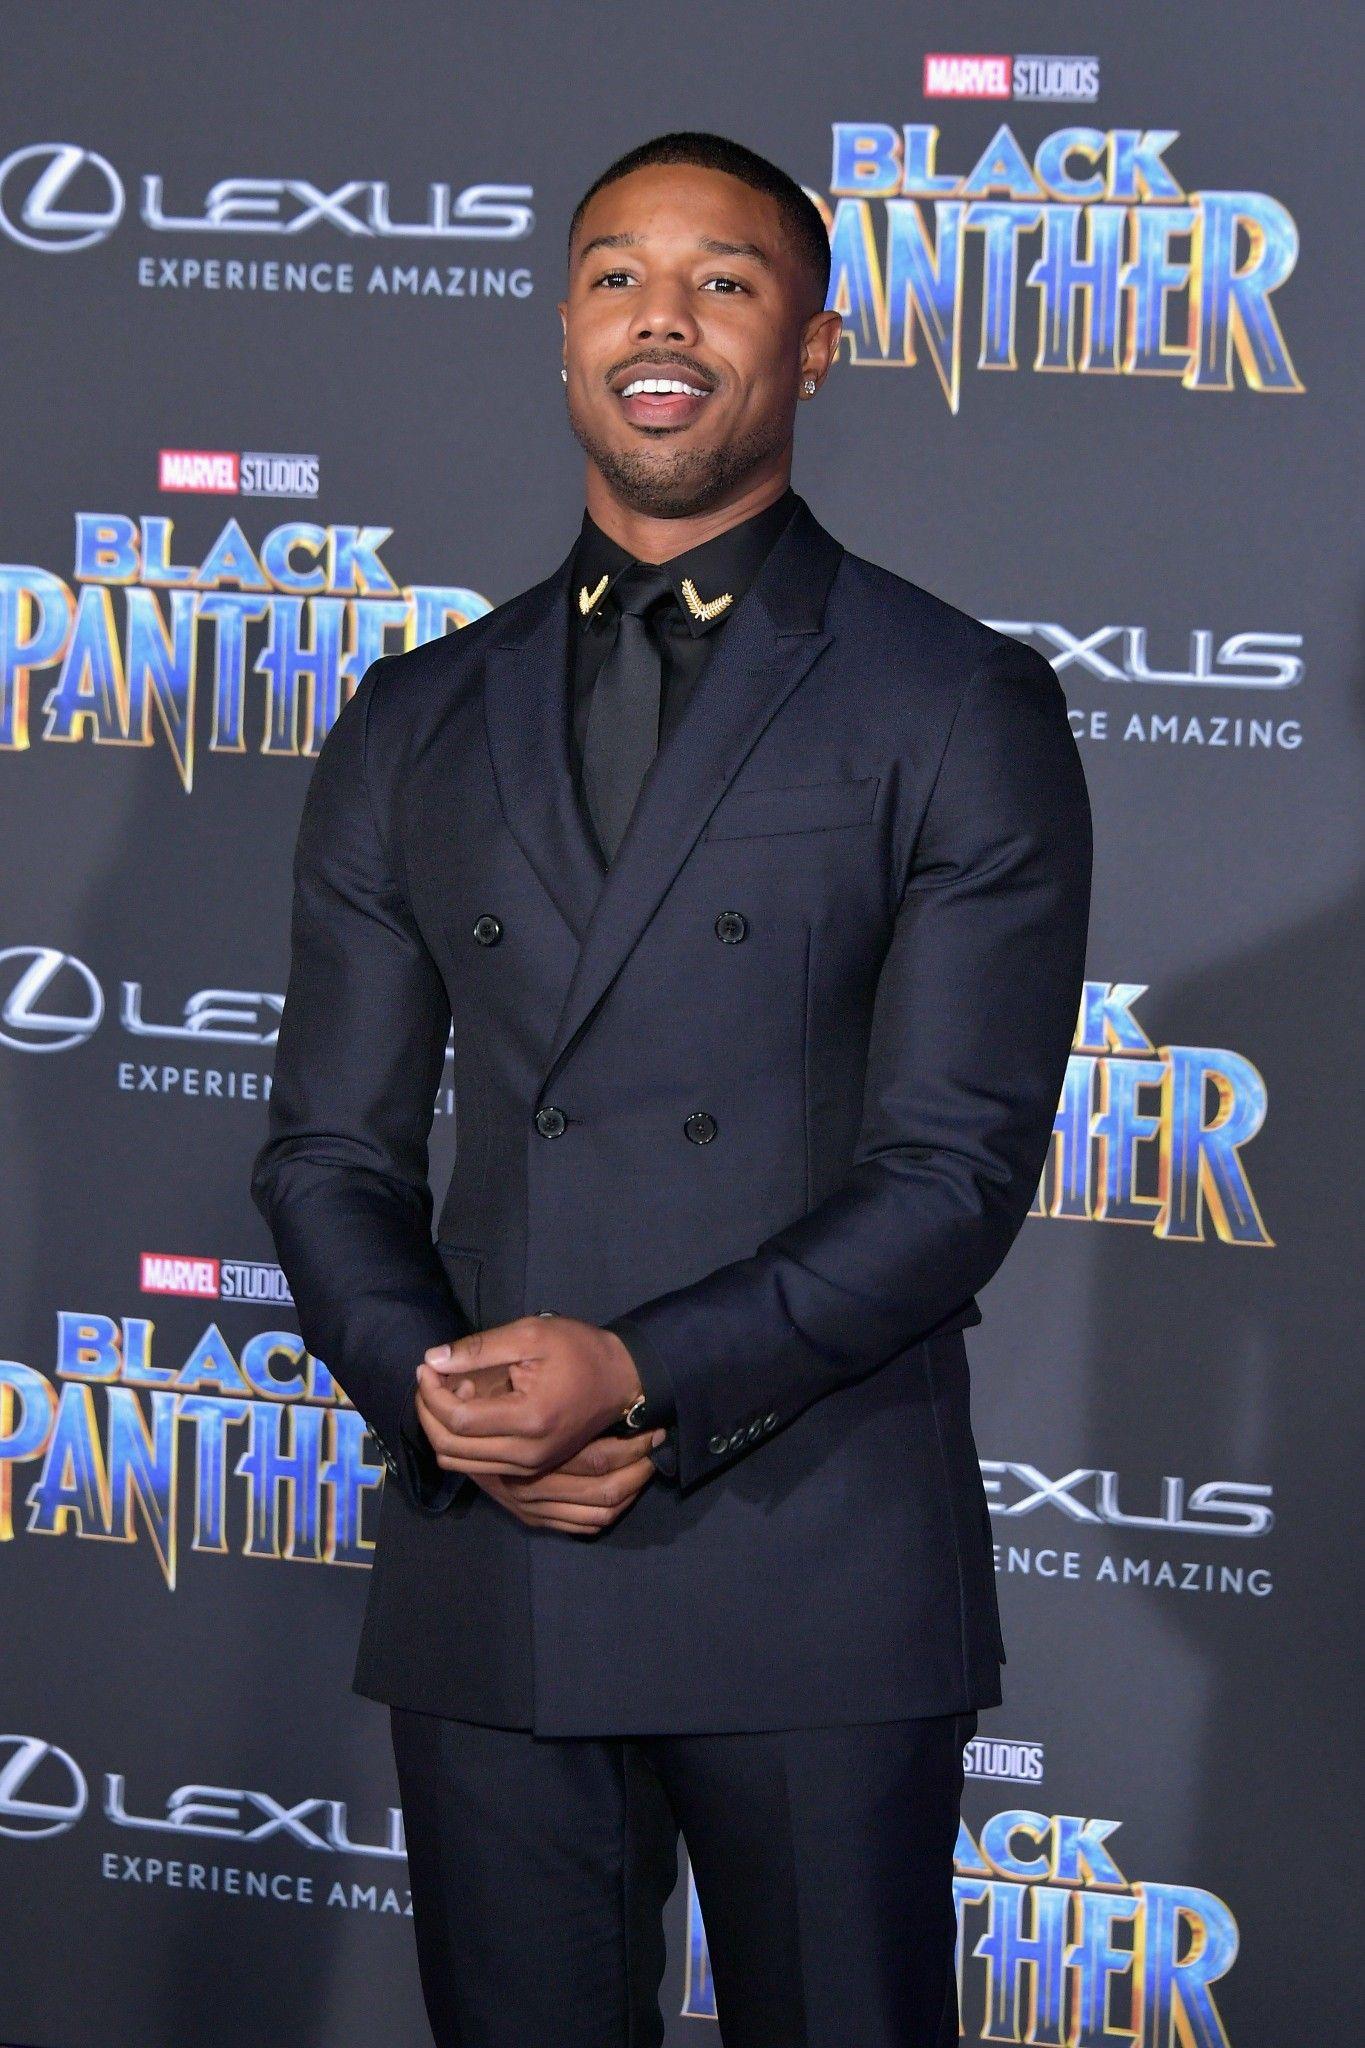 c1ab124d68a Michael B. Jordan at the Black Panther Premiere 1/29/2018 | Michael ...